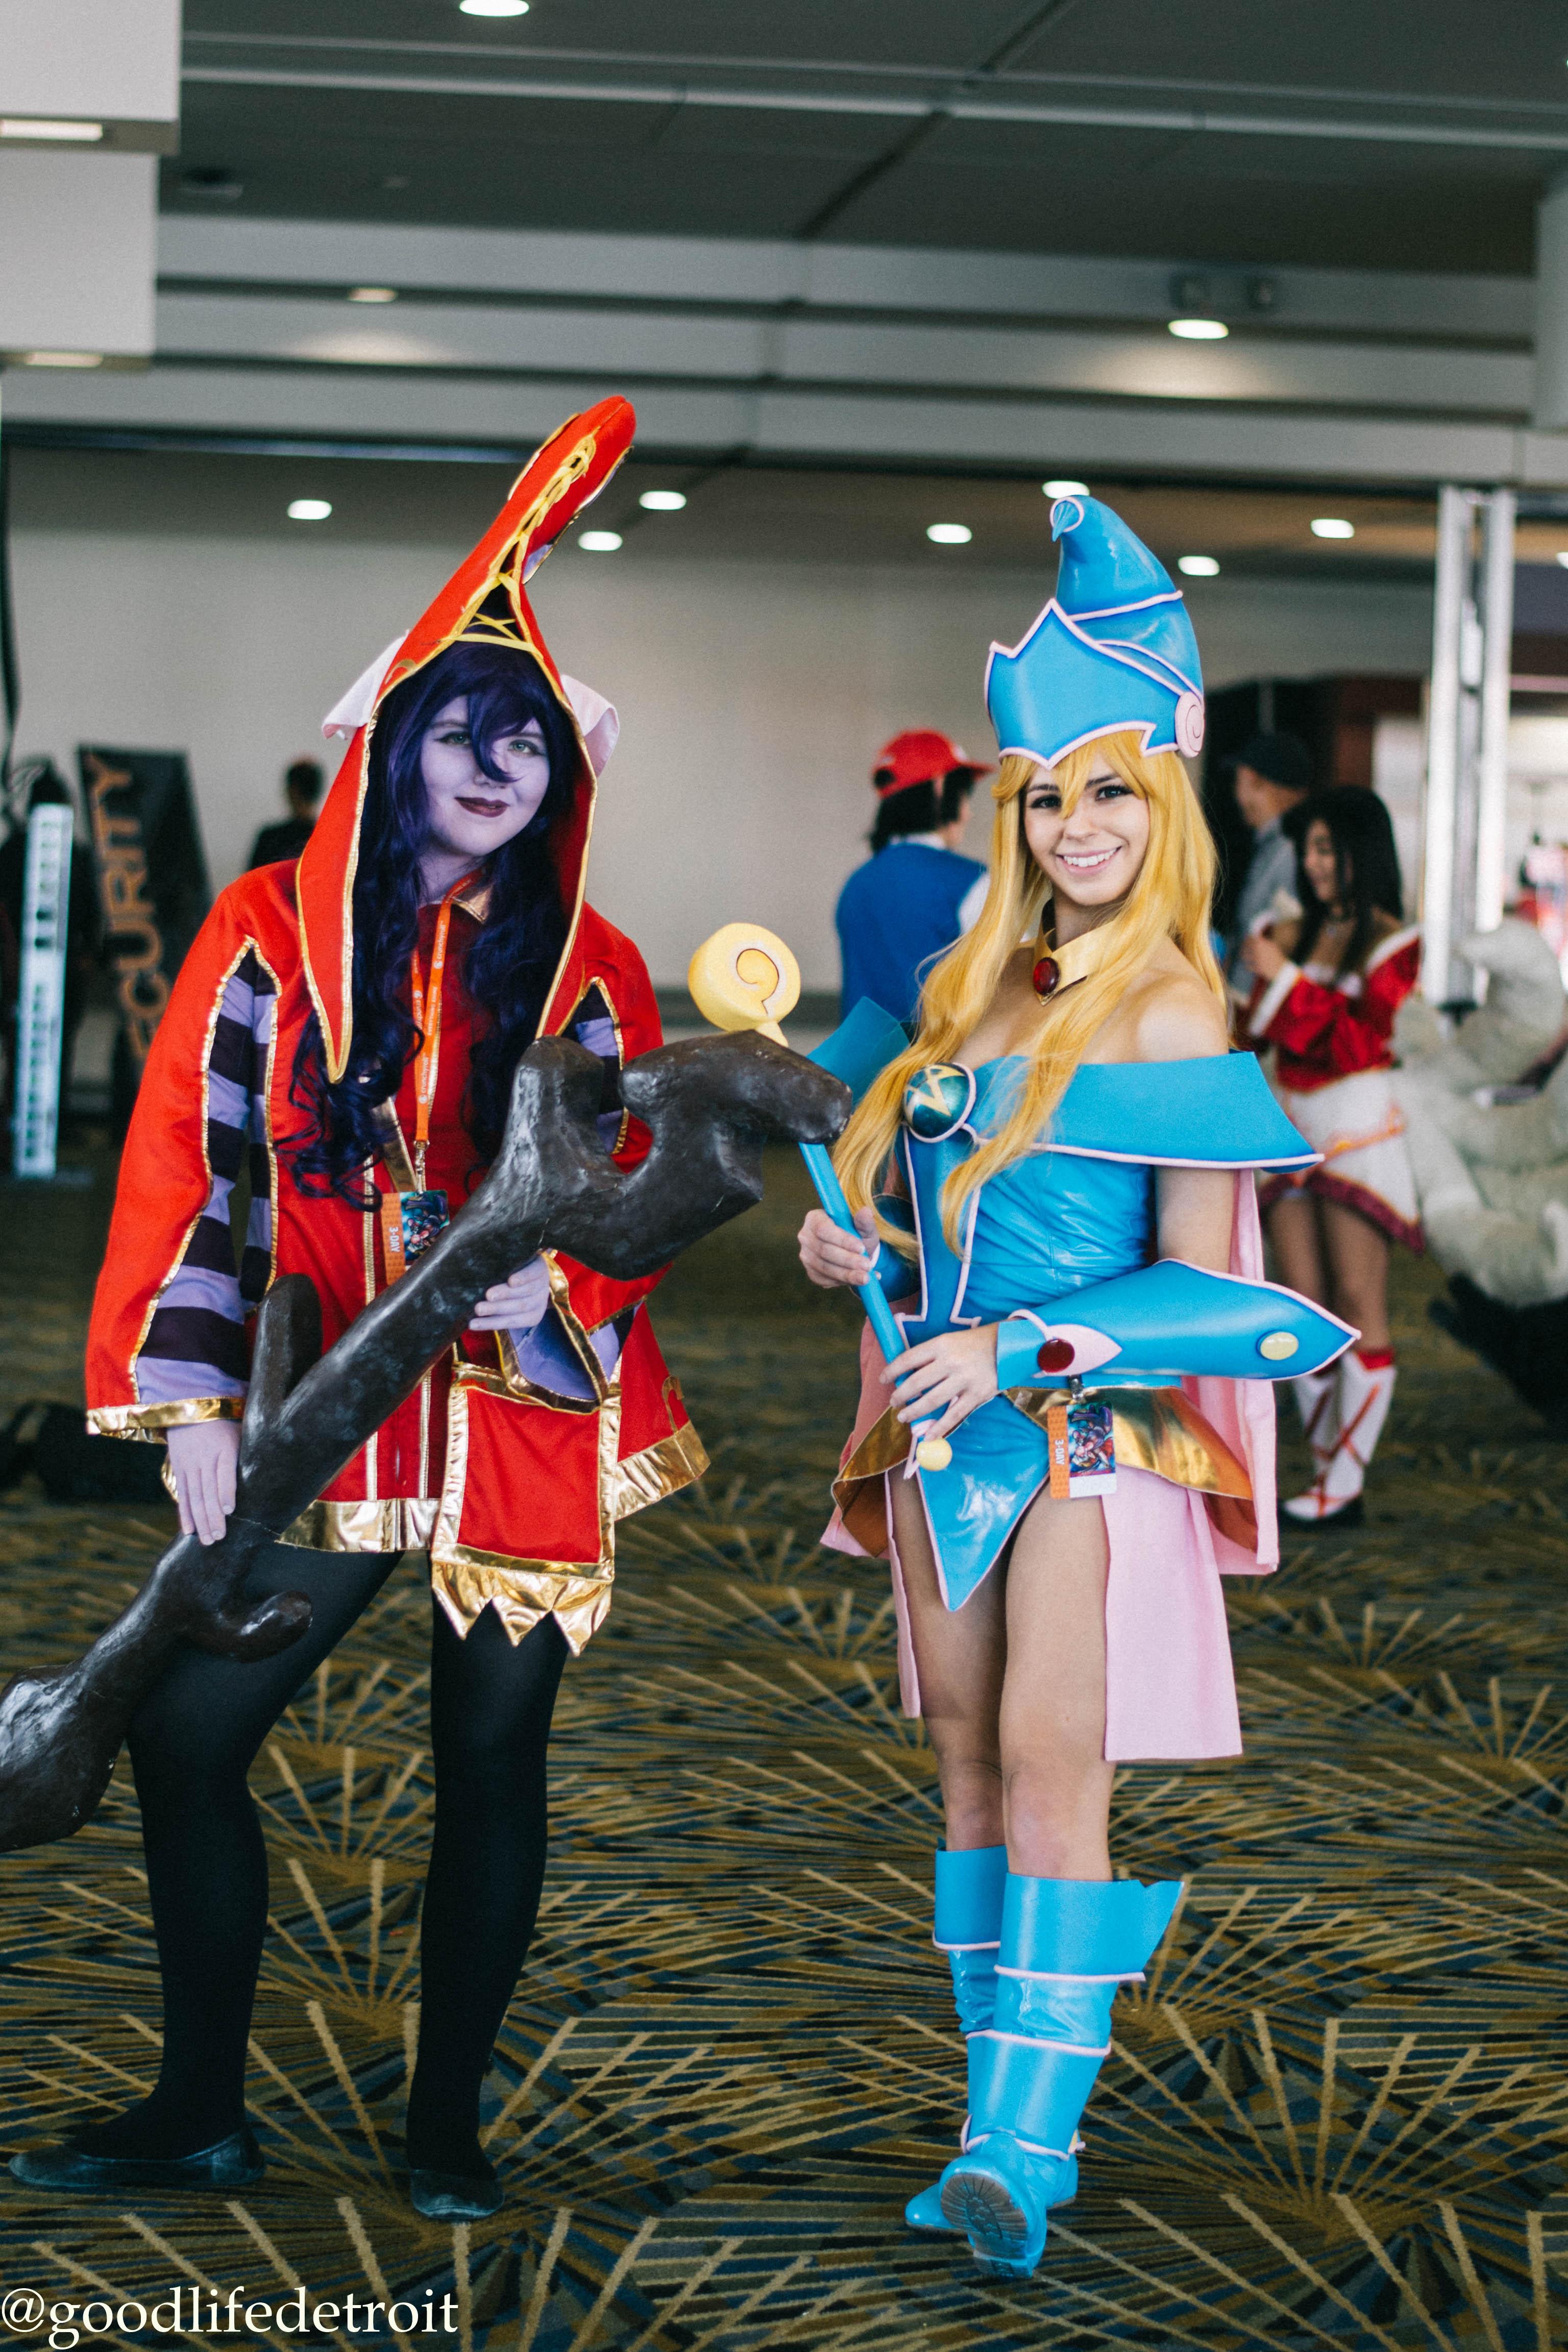 Youmacon 2016: Detroit's Largest Anime Convention